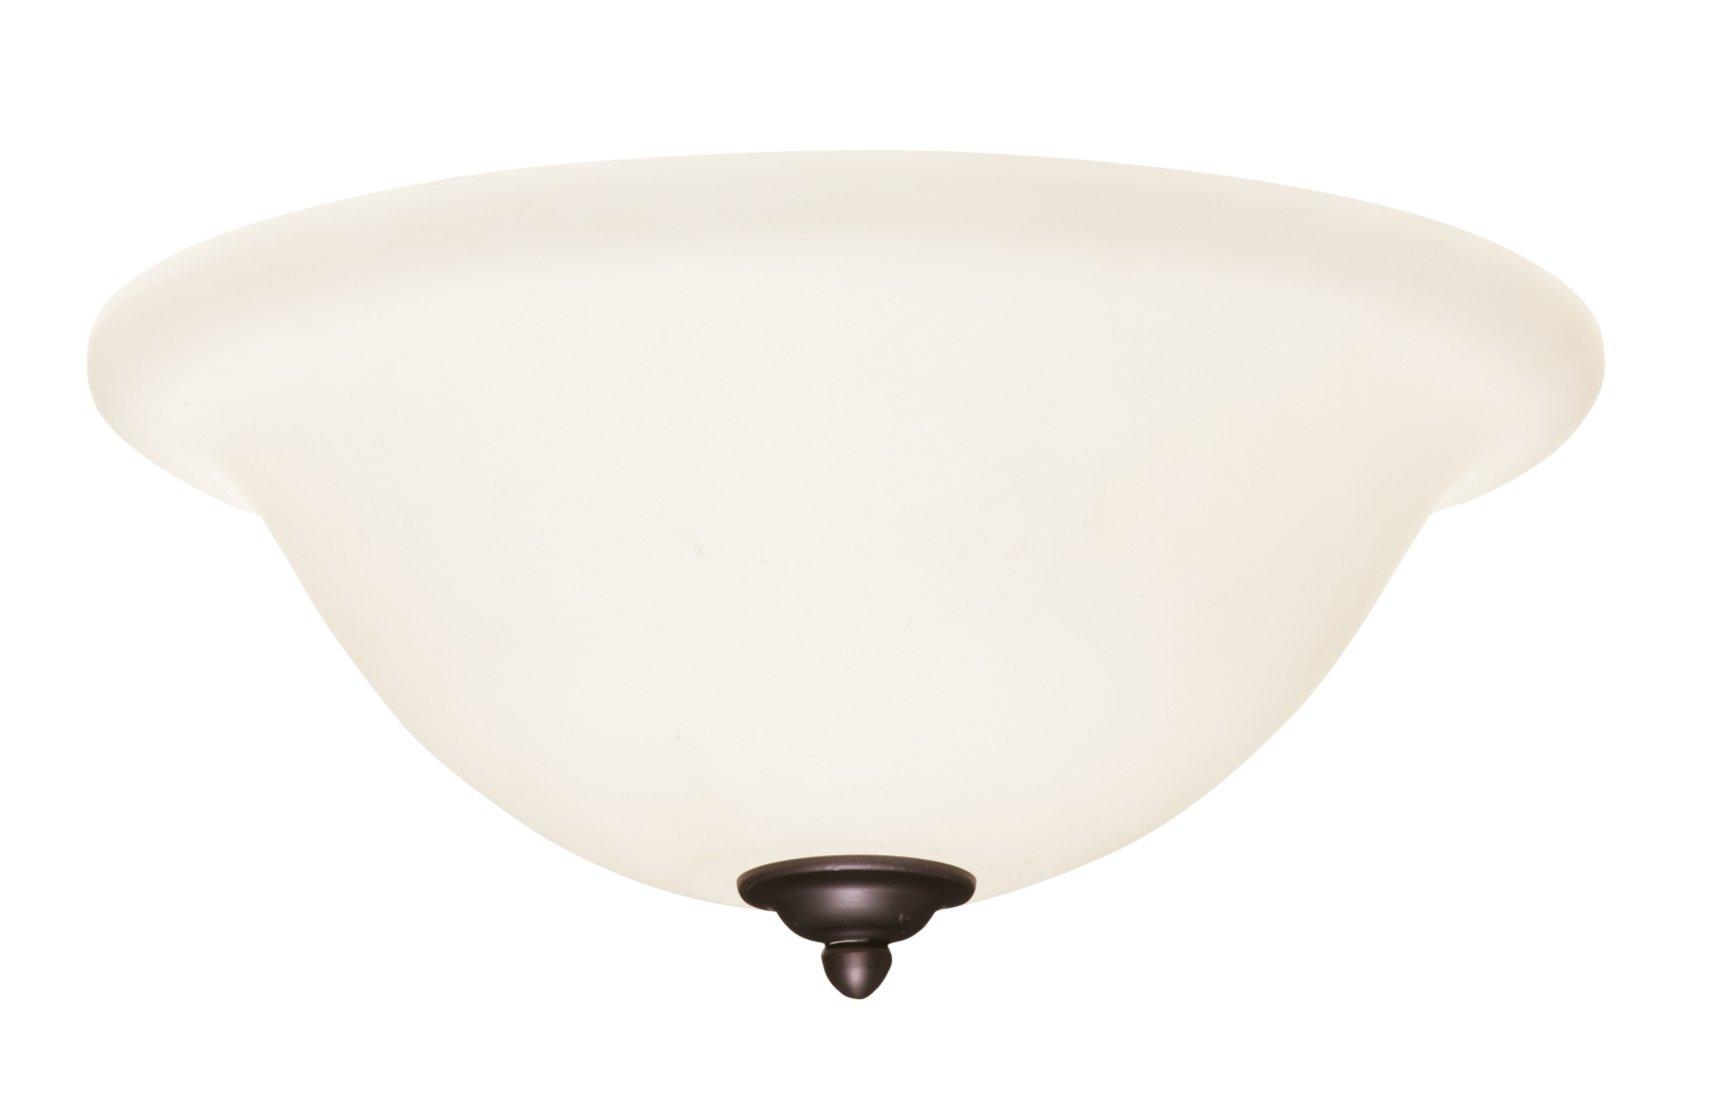 Emerson Ceiling Fans LK74AP Opal Matte Light Fixture for Ceiling Fans, Medium Base CFL